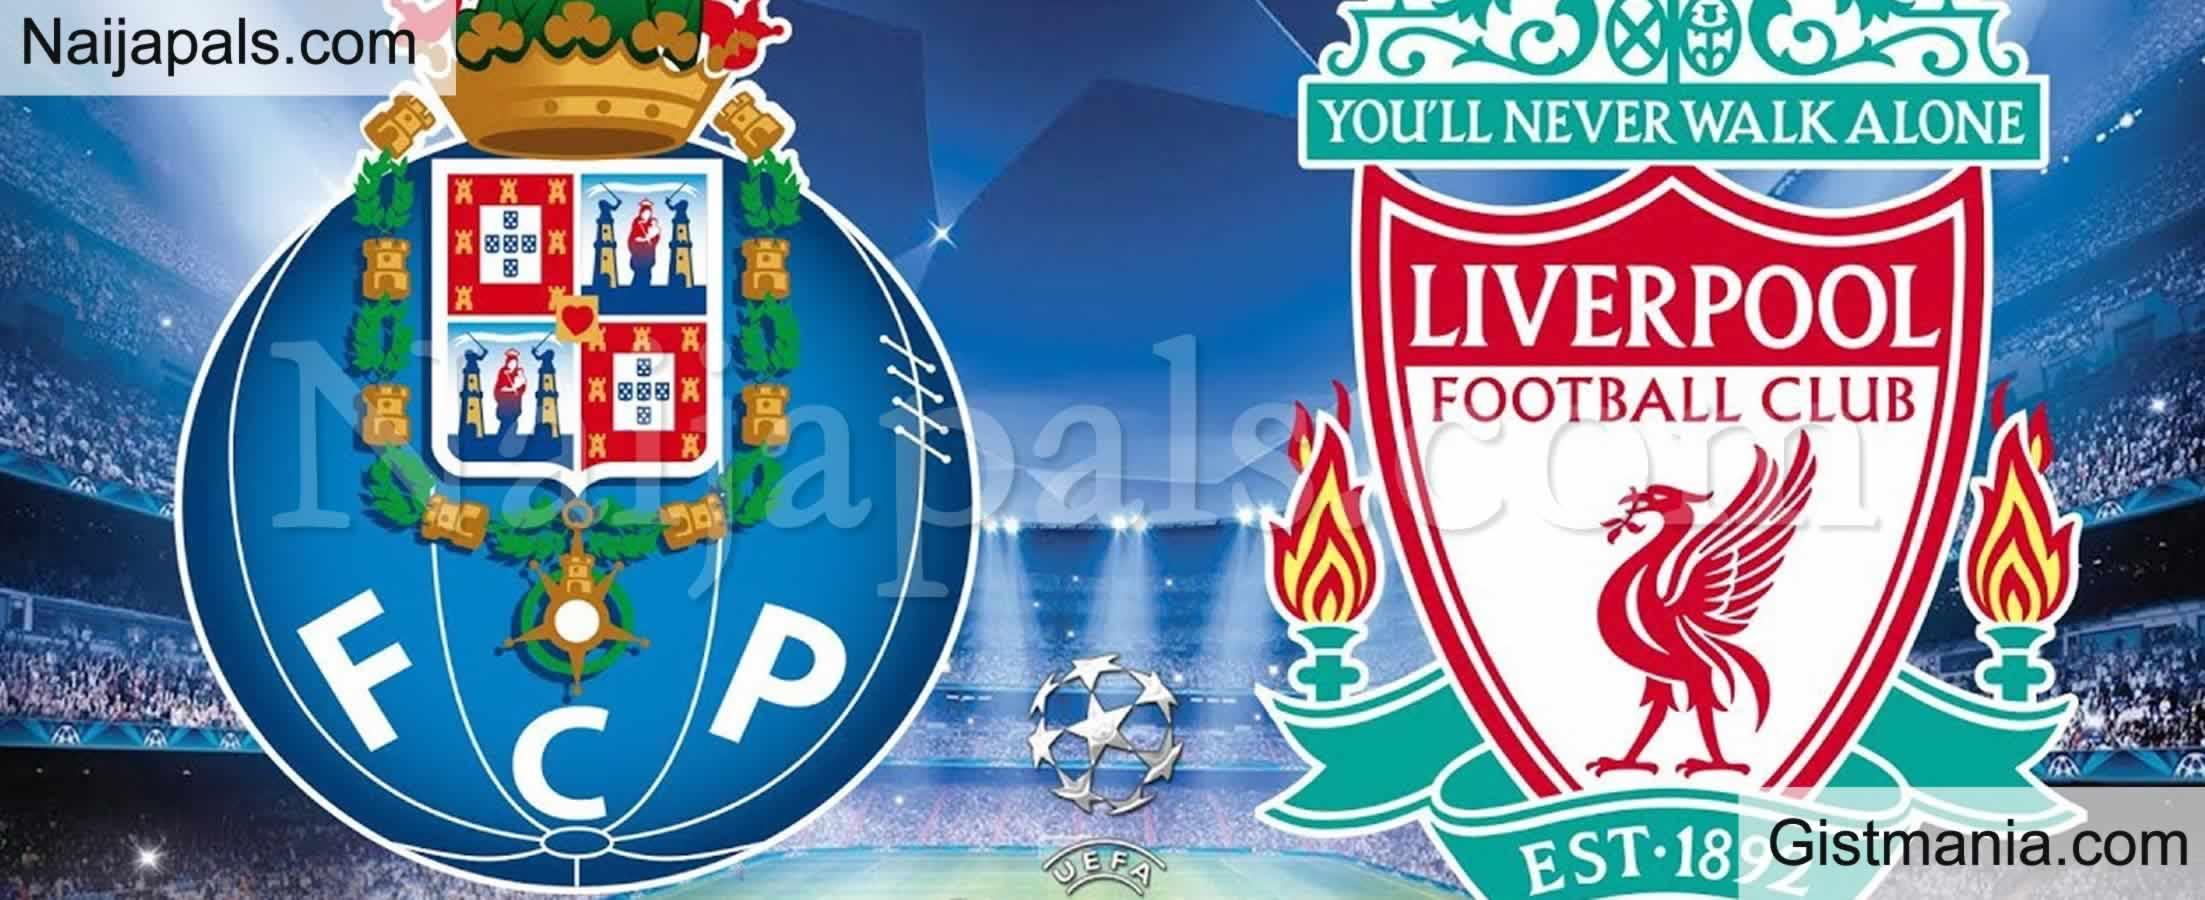 <img alt='.' class='lazyload' data-src='https://img.gistmania.com/emot/soccer.gif' /> <b>FC Porto v Liverpool : UEFA Champion's League Match, Team News, Goal Scorers and Stats</b>